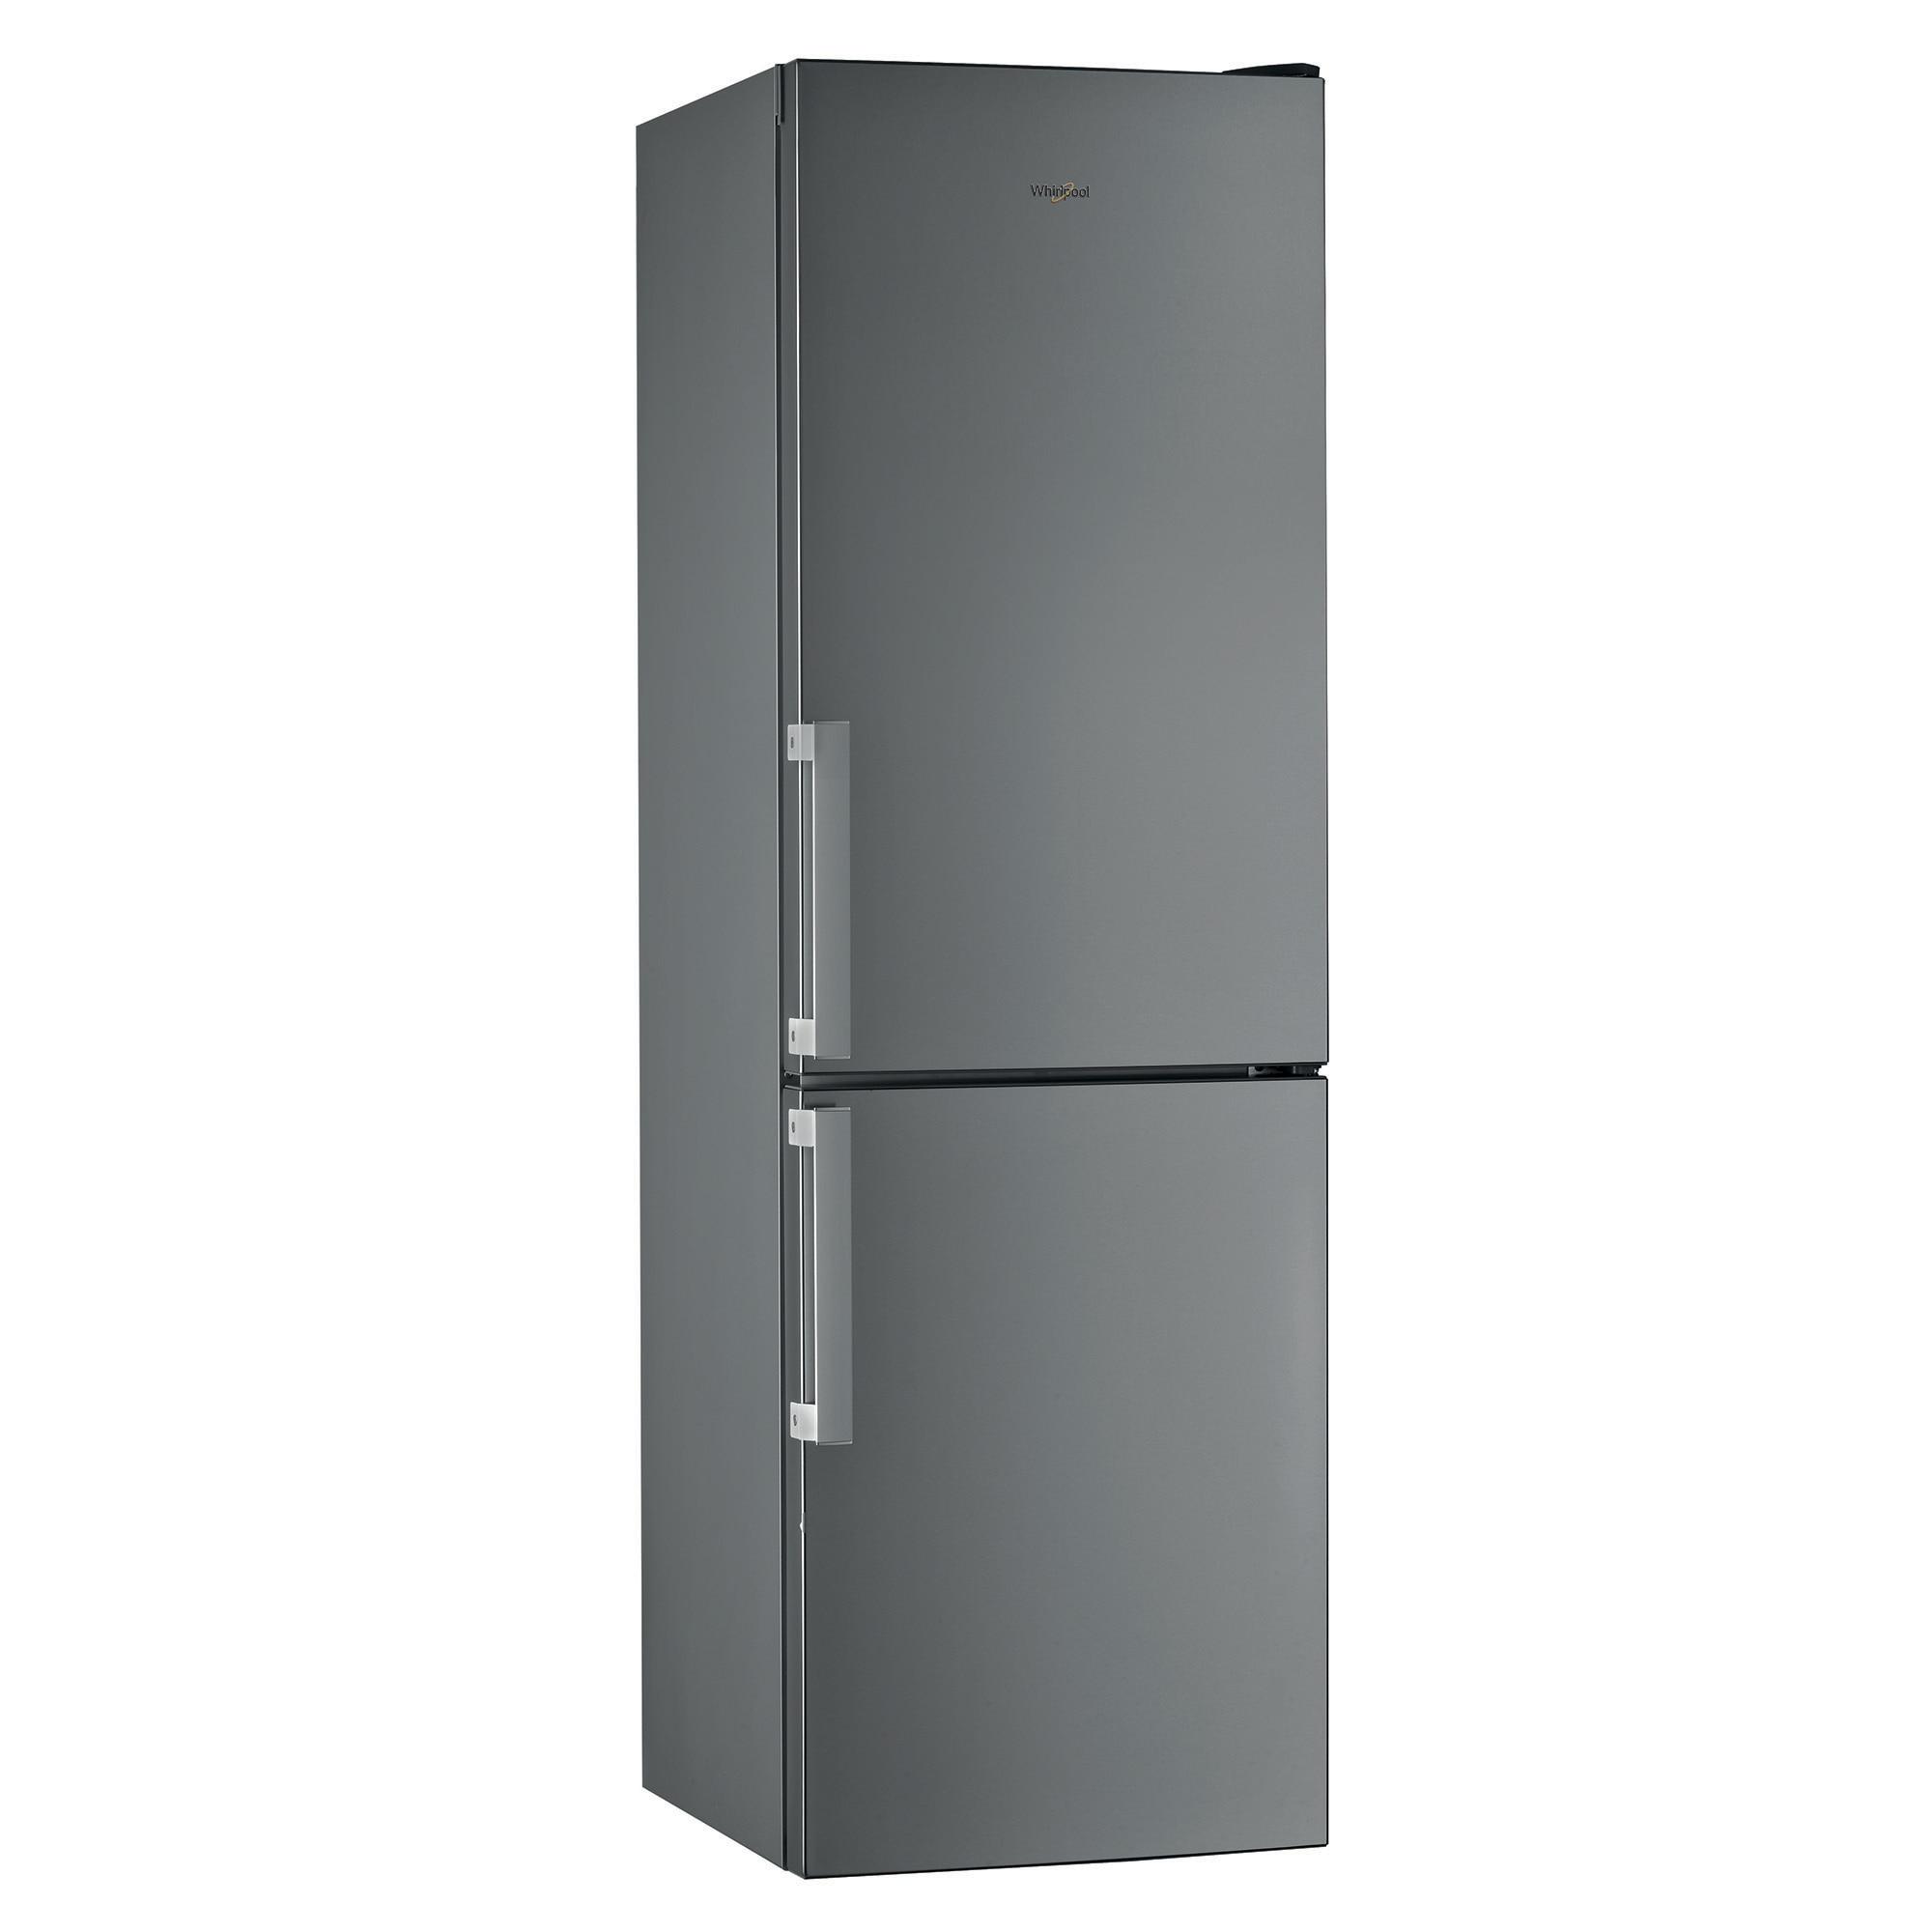 Fotografie Combina frigorifica Whirlpool W5 811E OX H, 339 l, Clasa F, Less Frost, 6th Sense, H 189 cm, Inox